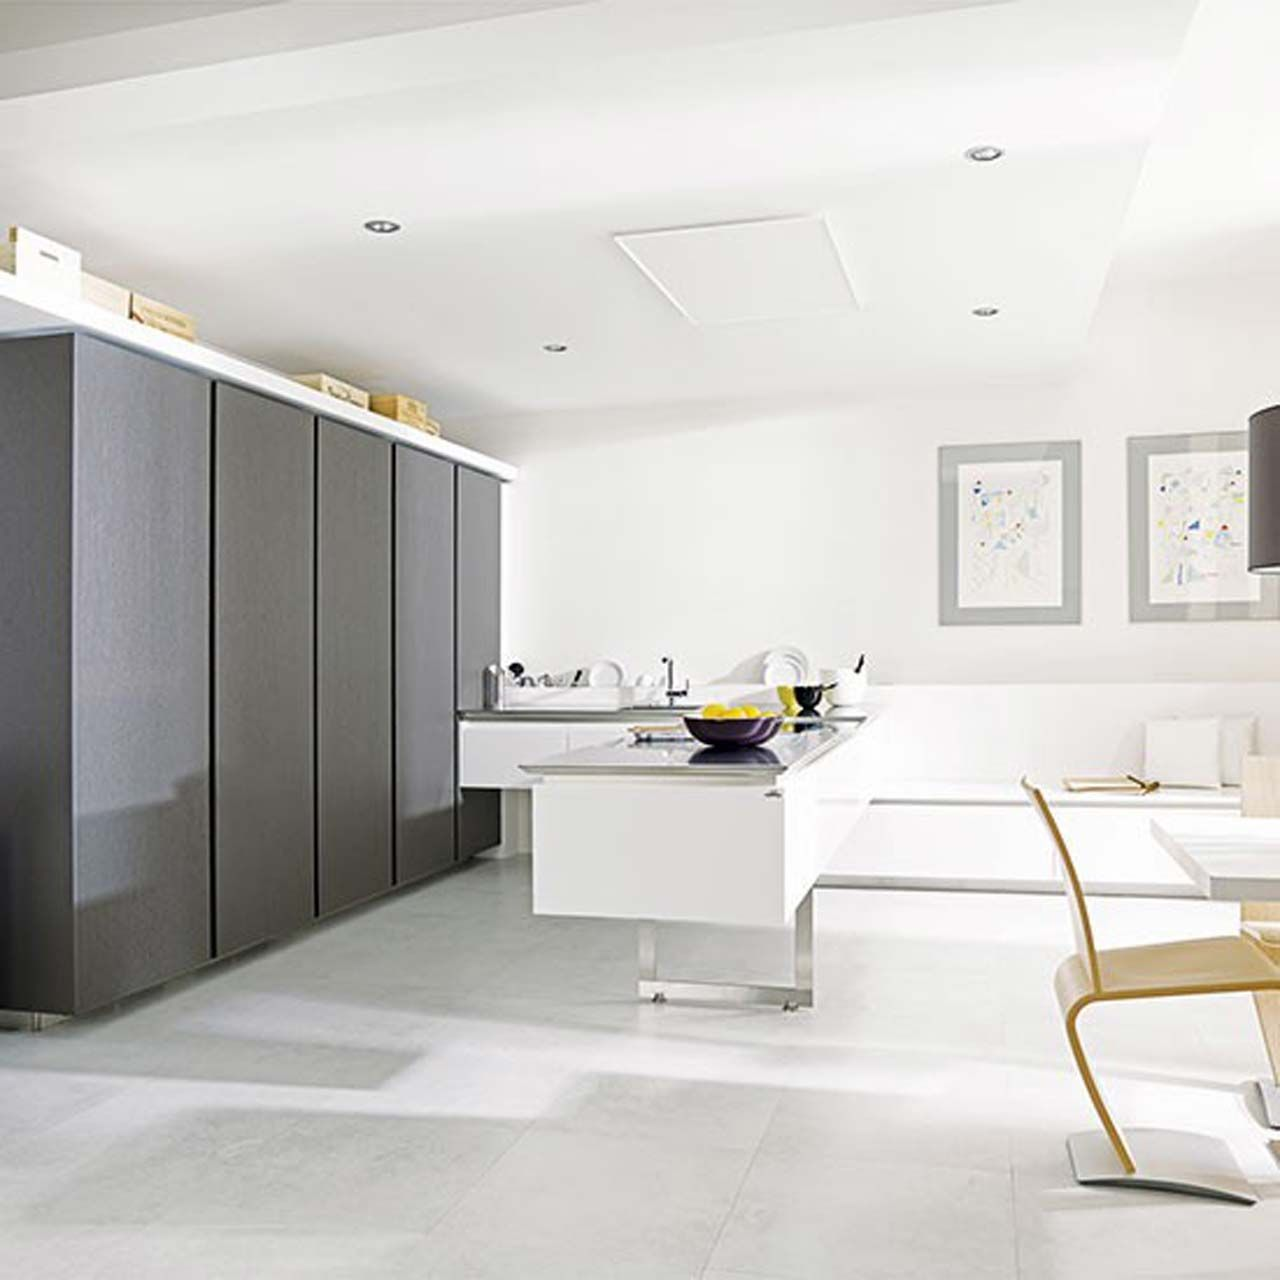 Porcelanosa white kitchen design ideas lookmyhomes